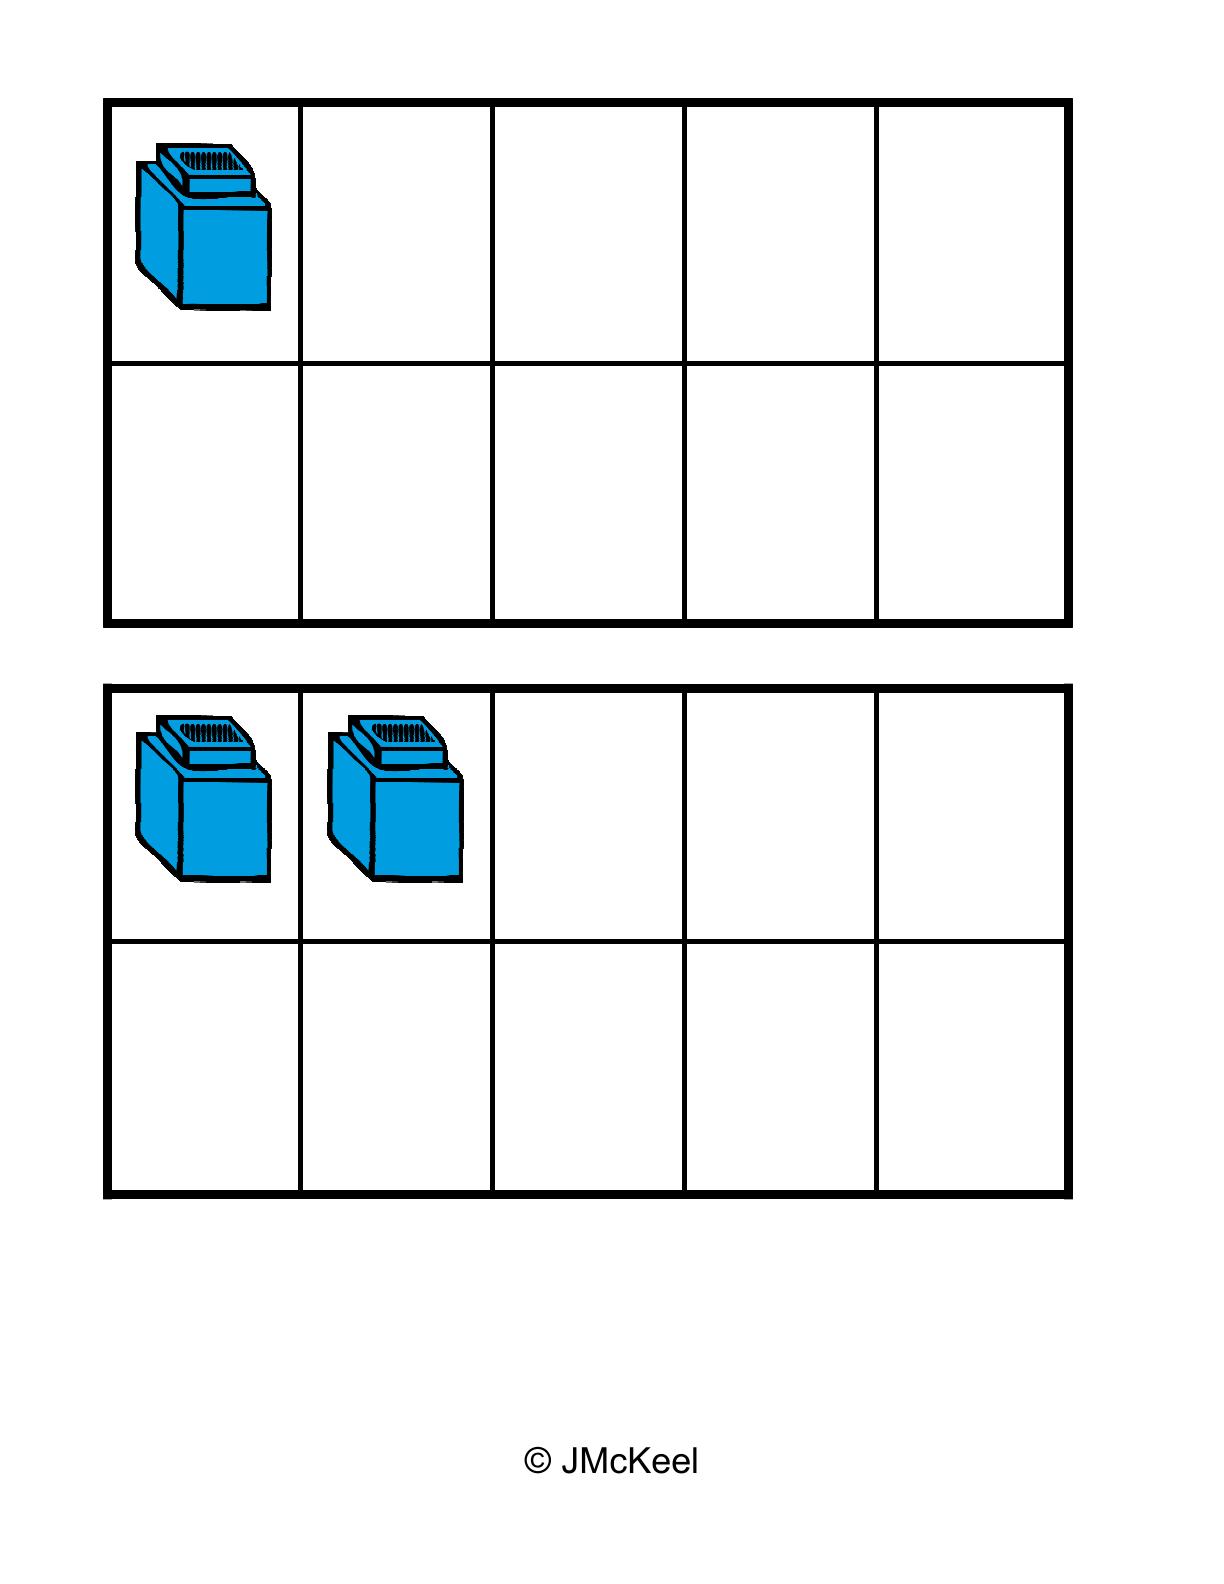 Free Unifix Cubes Clipart Download Free Clip Art Free Clip Art On Clipart Library